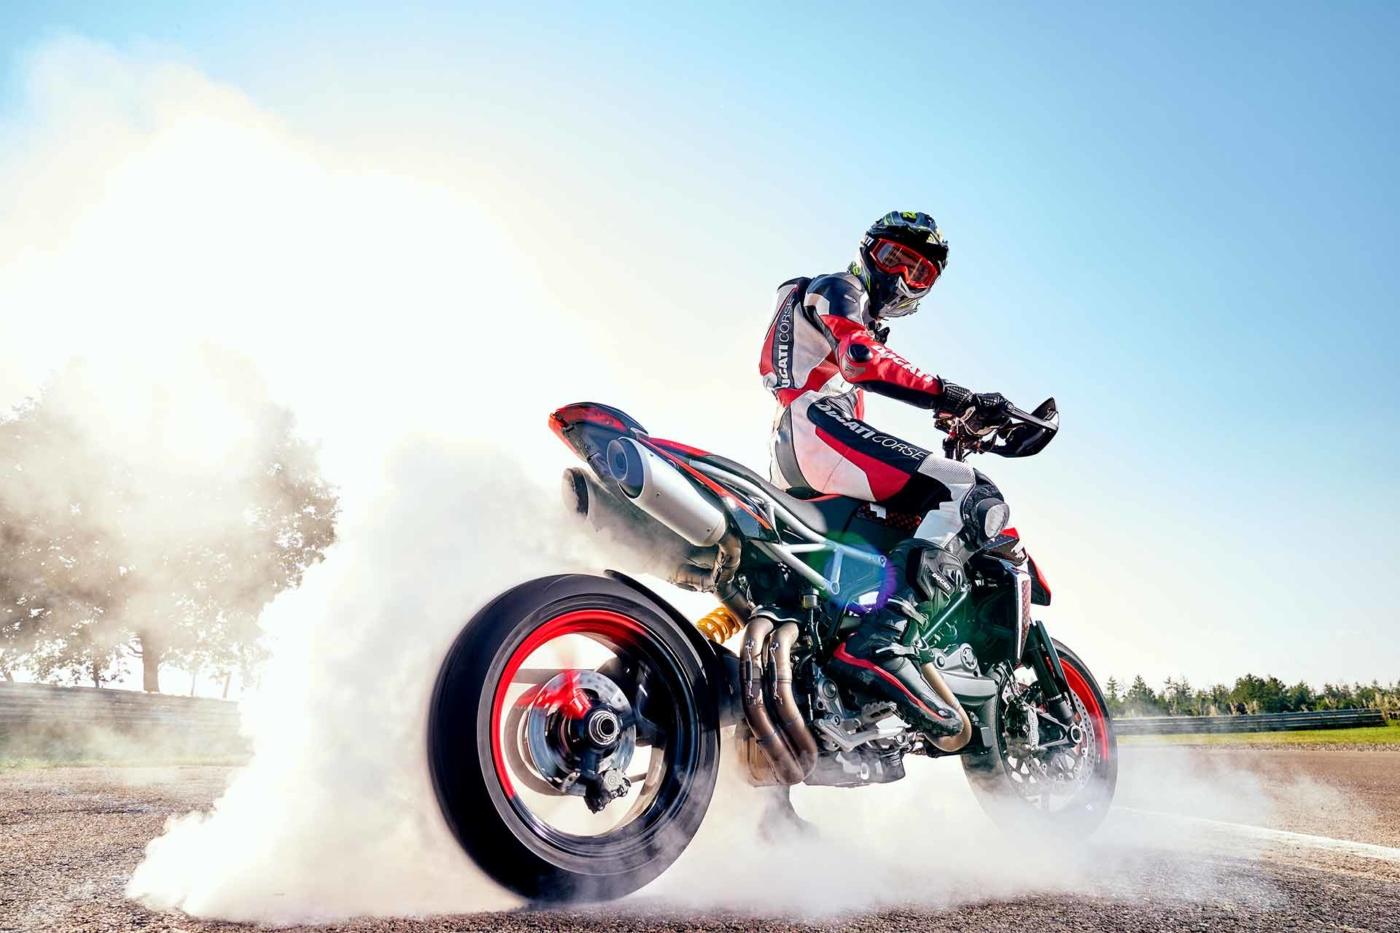 imagen moto hypermotard RVE